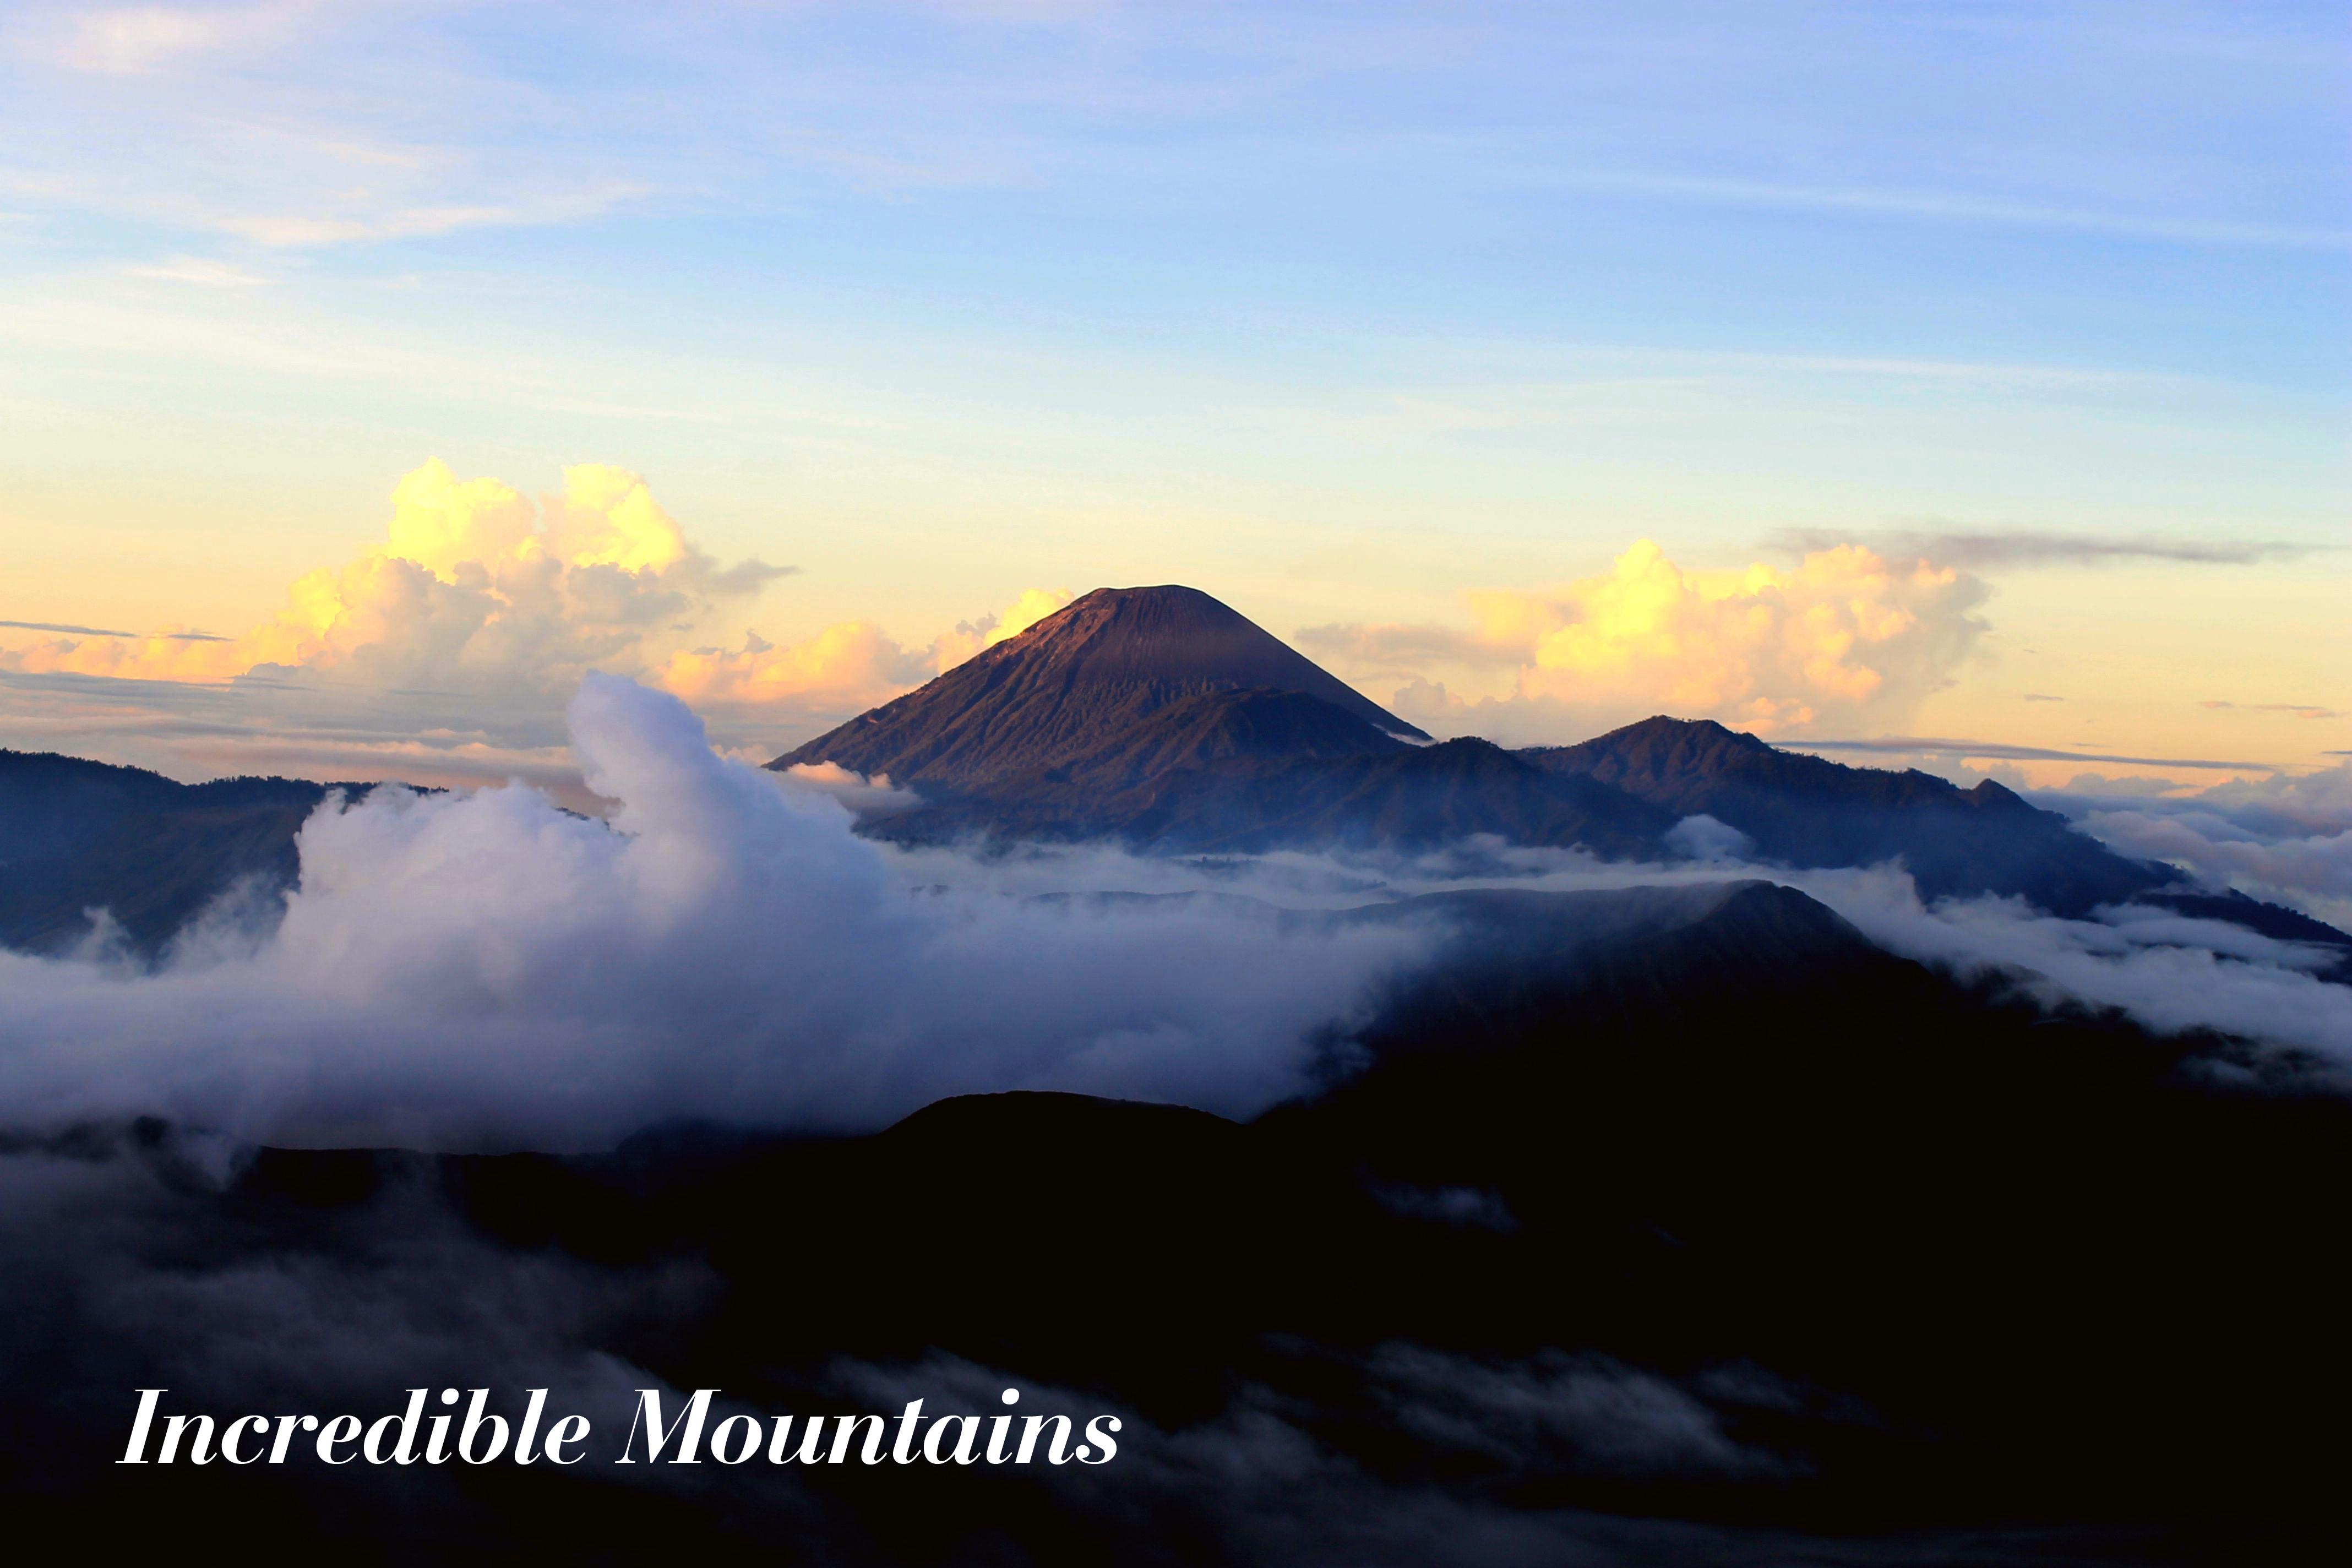 Incredible Mountains.JPG